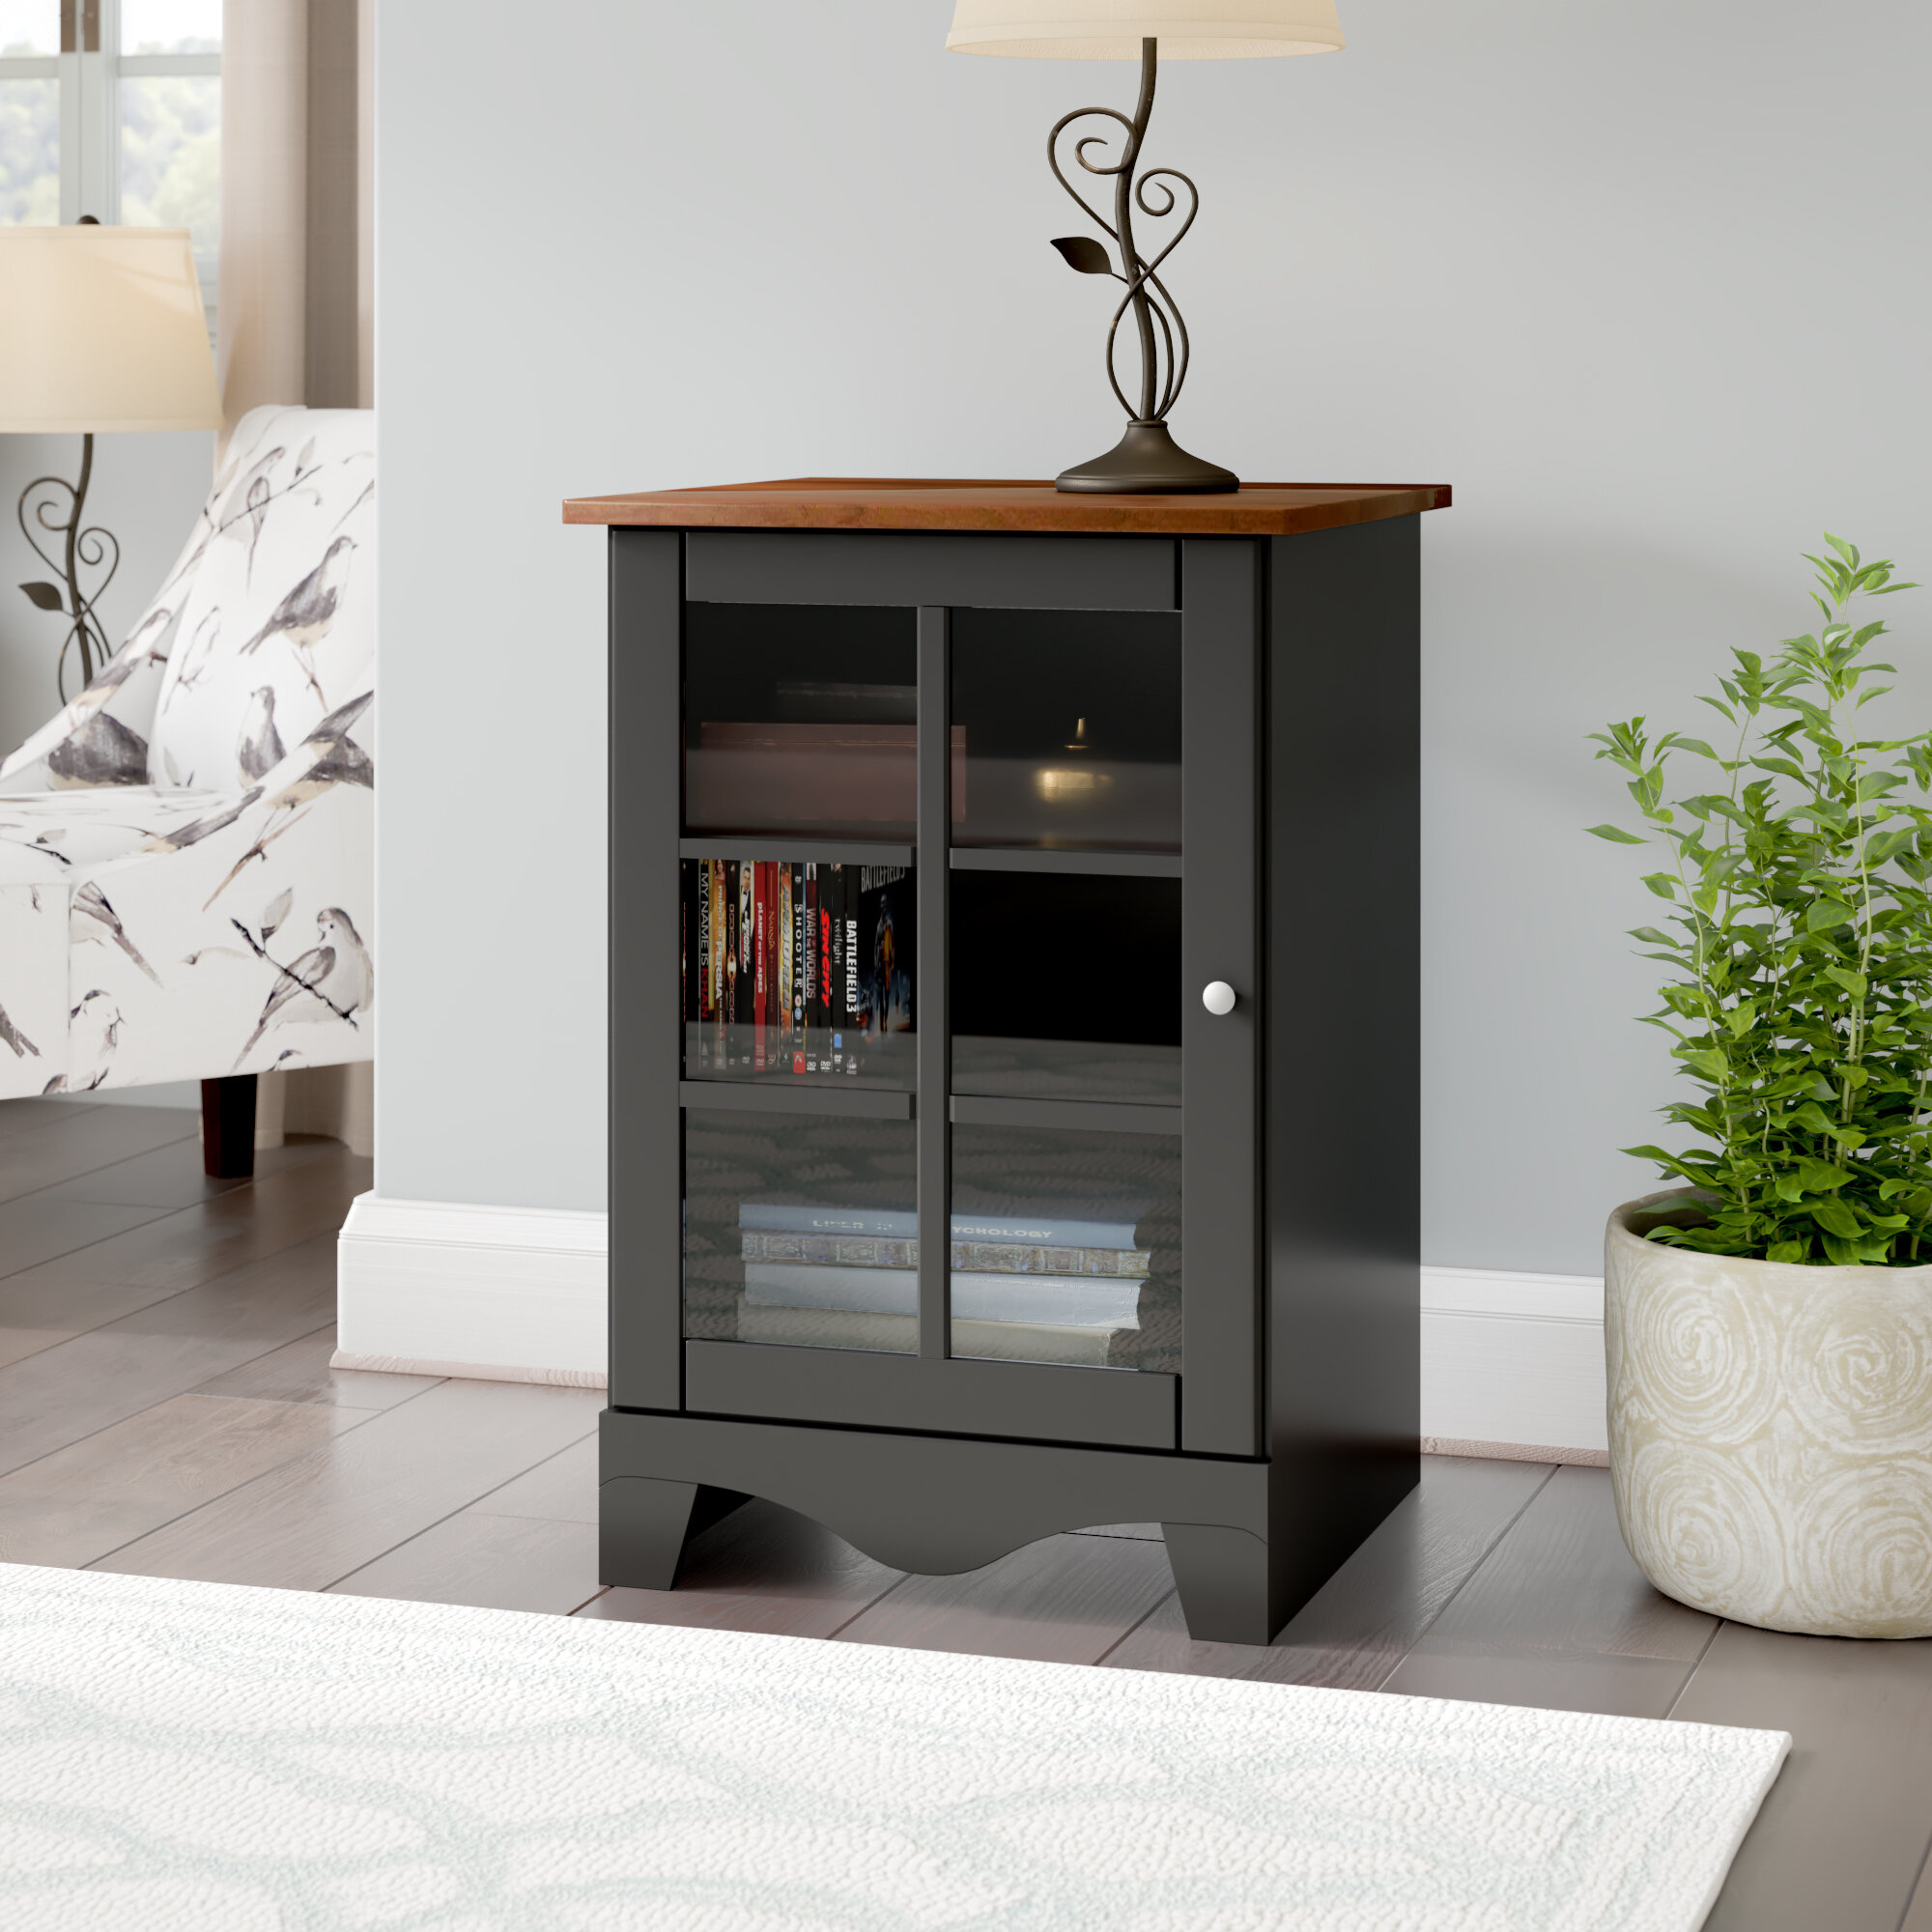 Phenomenal Audio Cabinets Youll Love In 2019 Wayfair Interior Design Ideas Gentotryabchikinfo